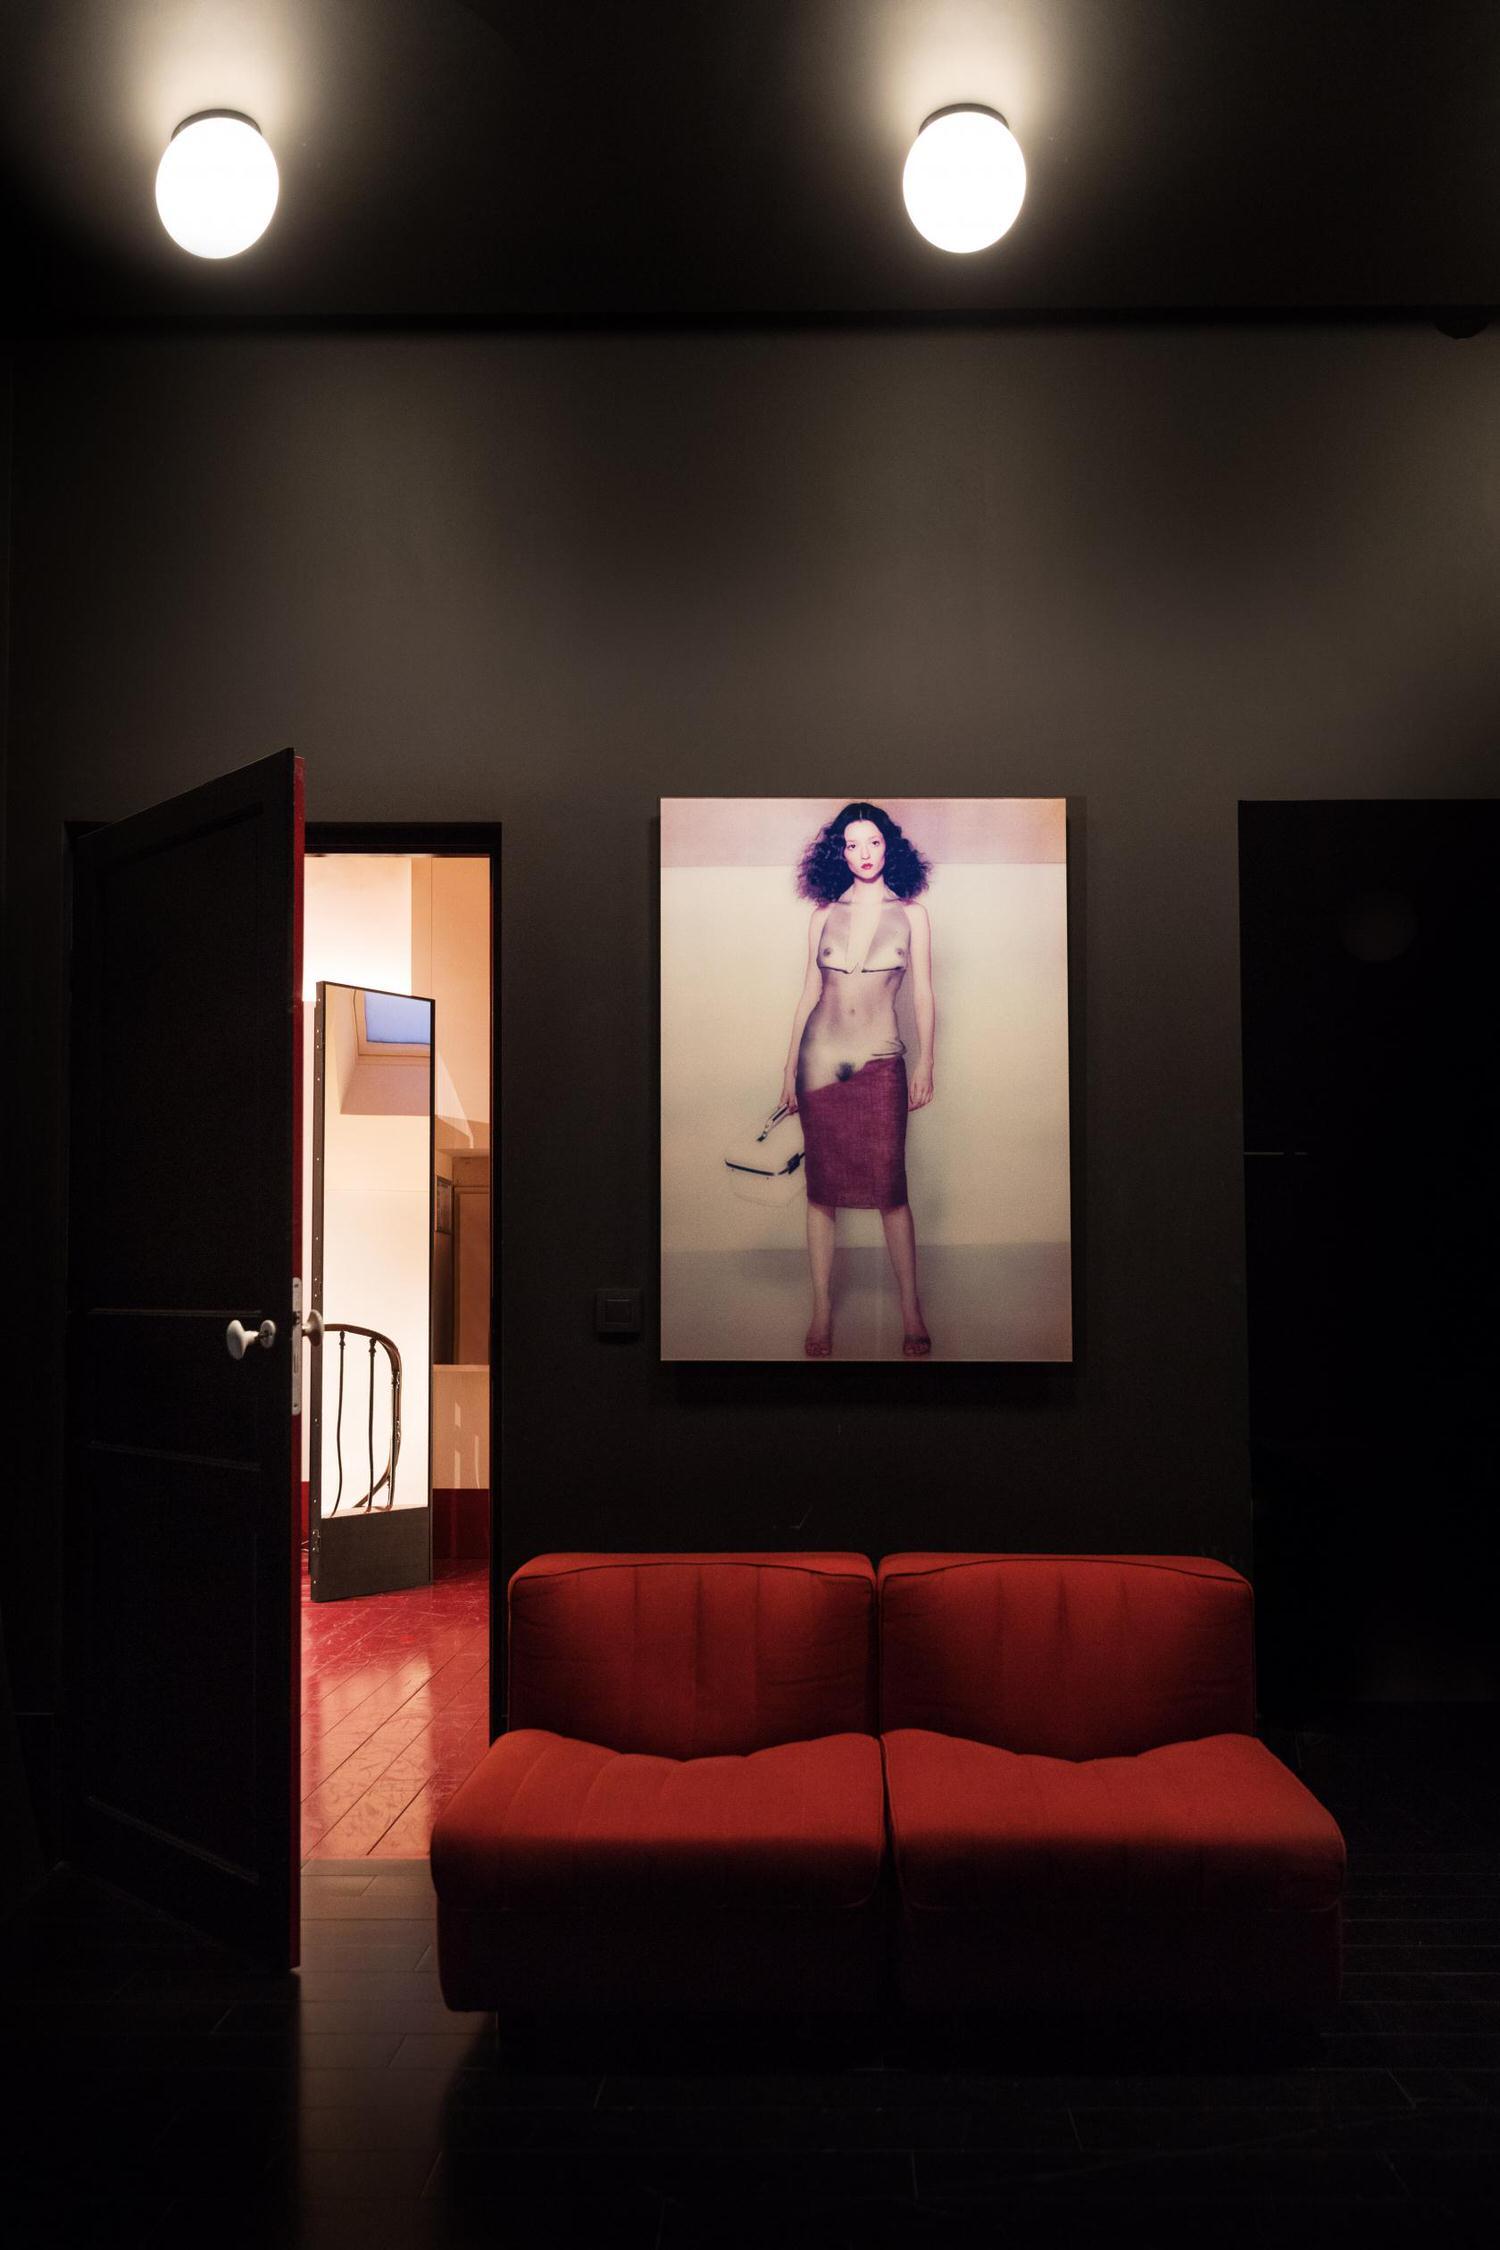 Al Dente Creative Agency Paris Hq Photo Roberta Valerio Yellowtrace 20